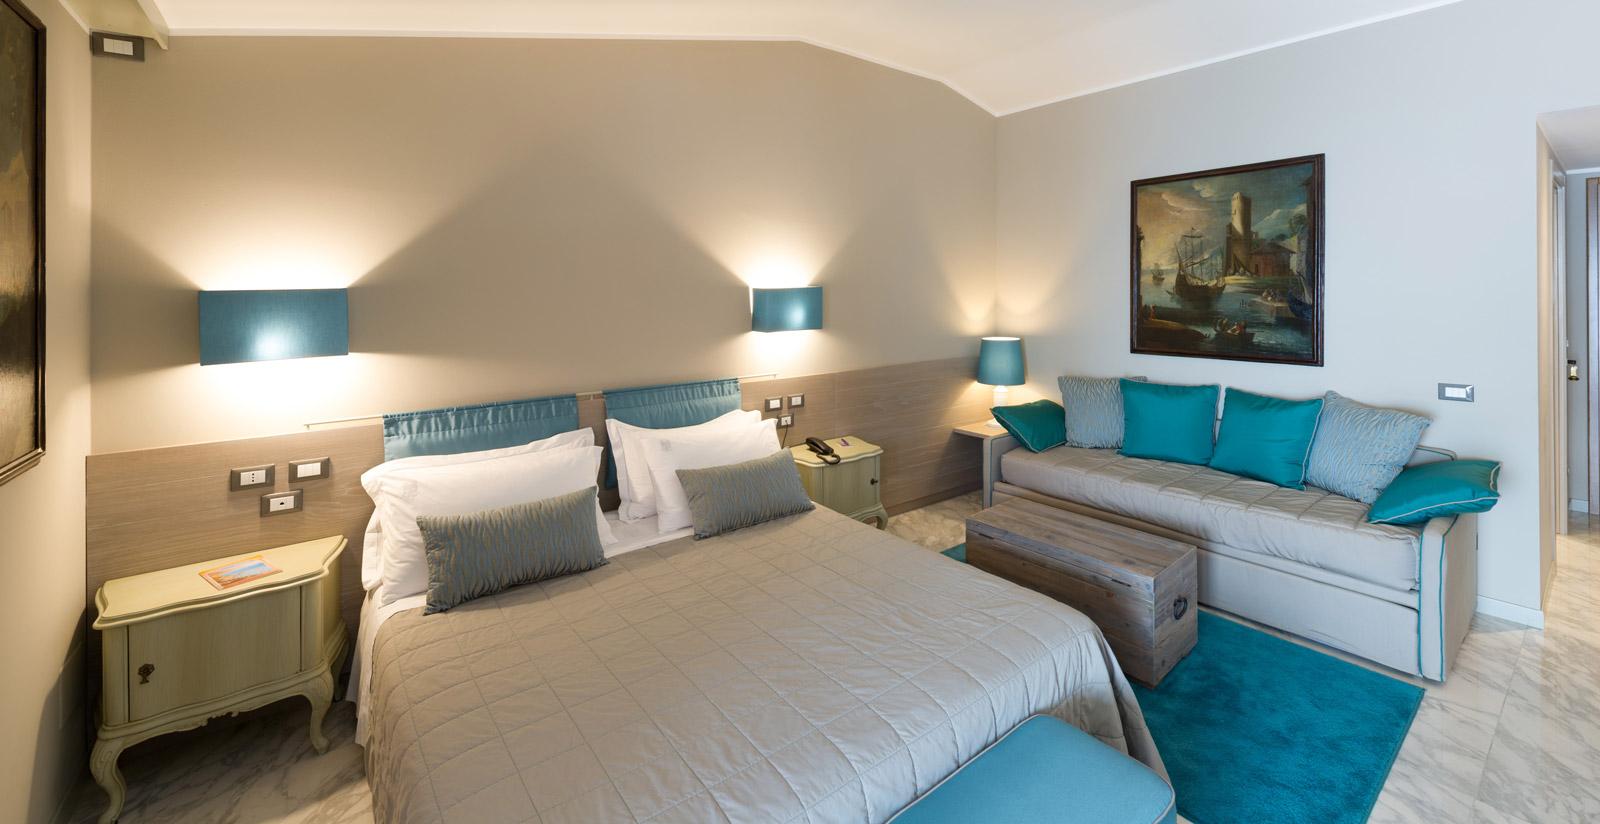 Discover The Rooms Of Hotel Porto Roca 4 Star Hotel In